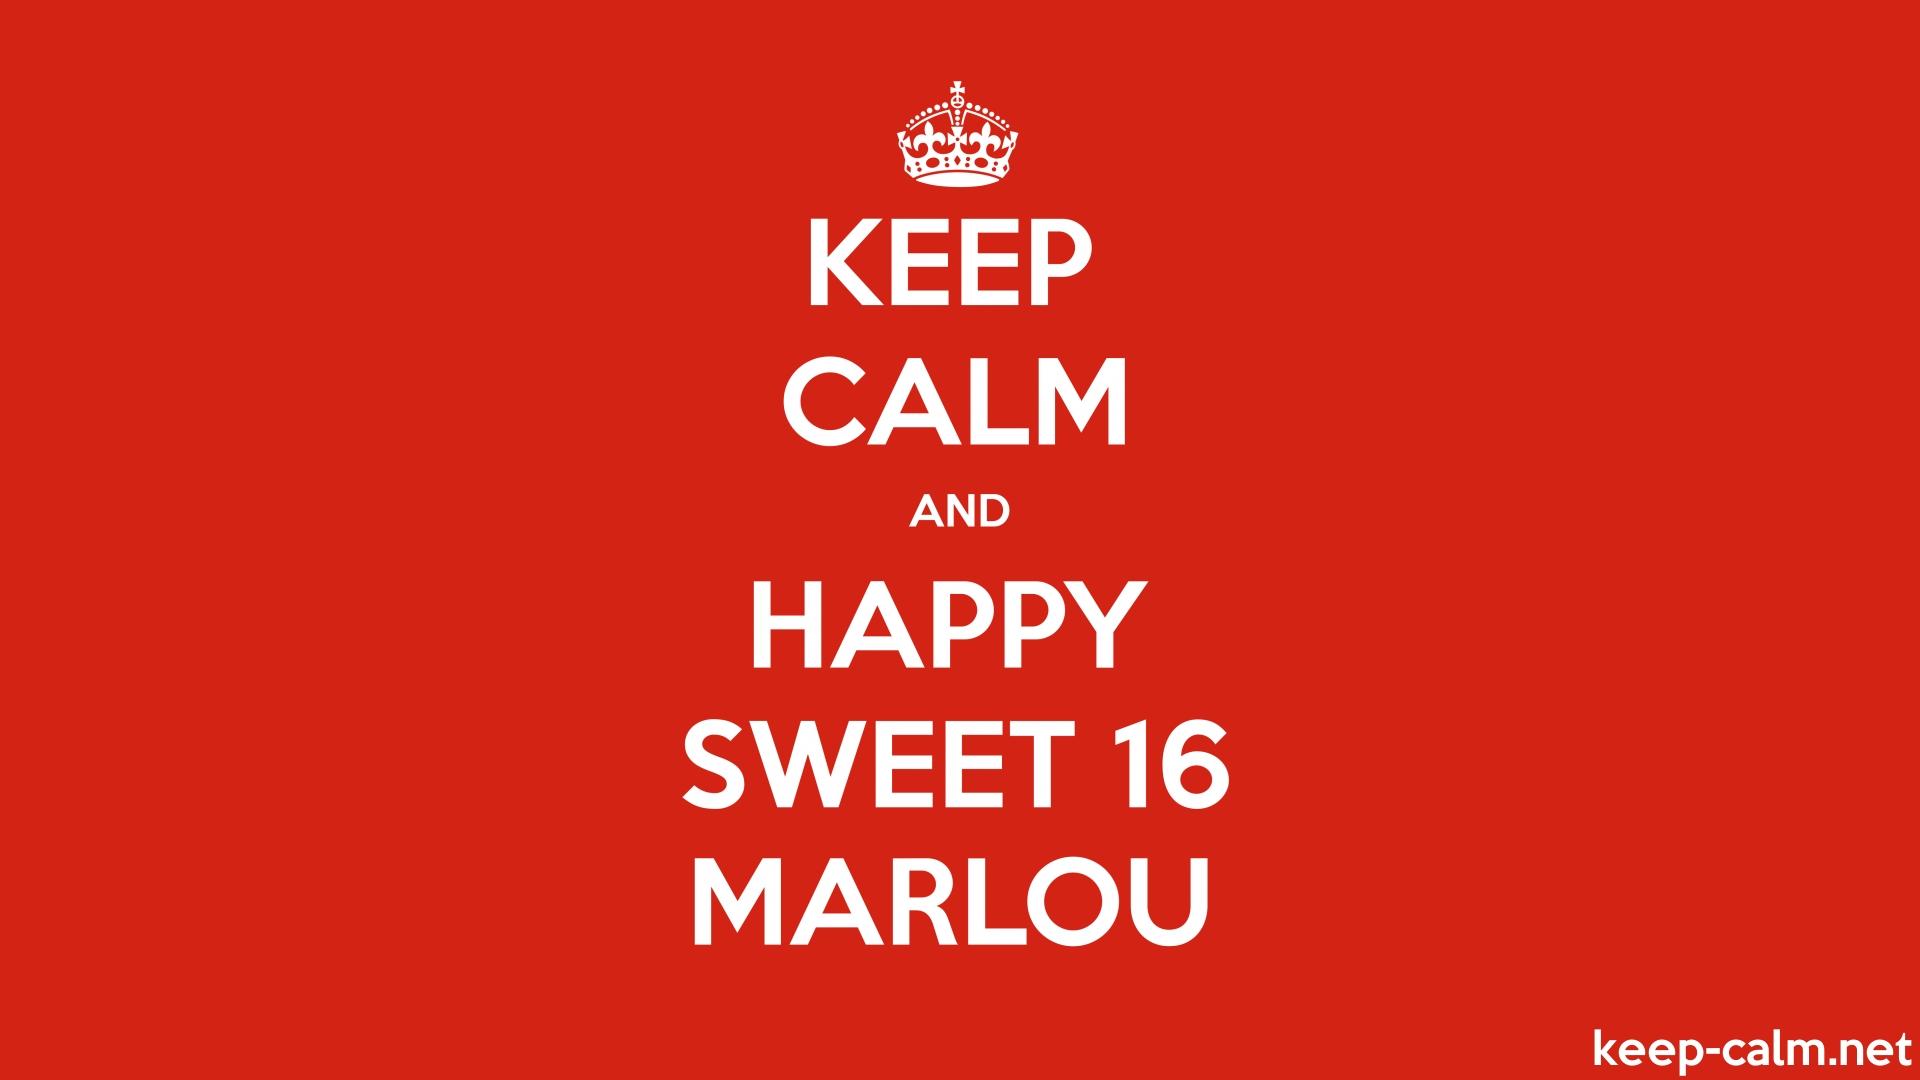 KEEP CALM AND HAPPY SWEET 16 MARLOU